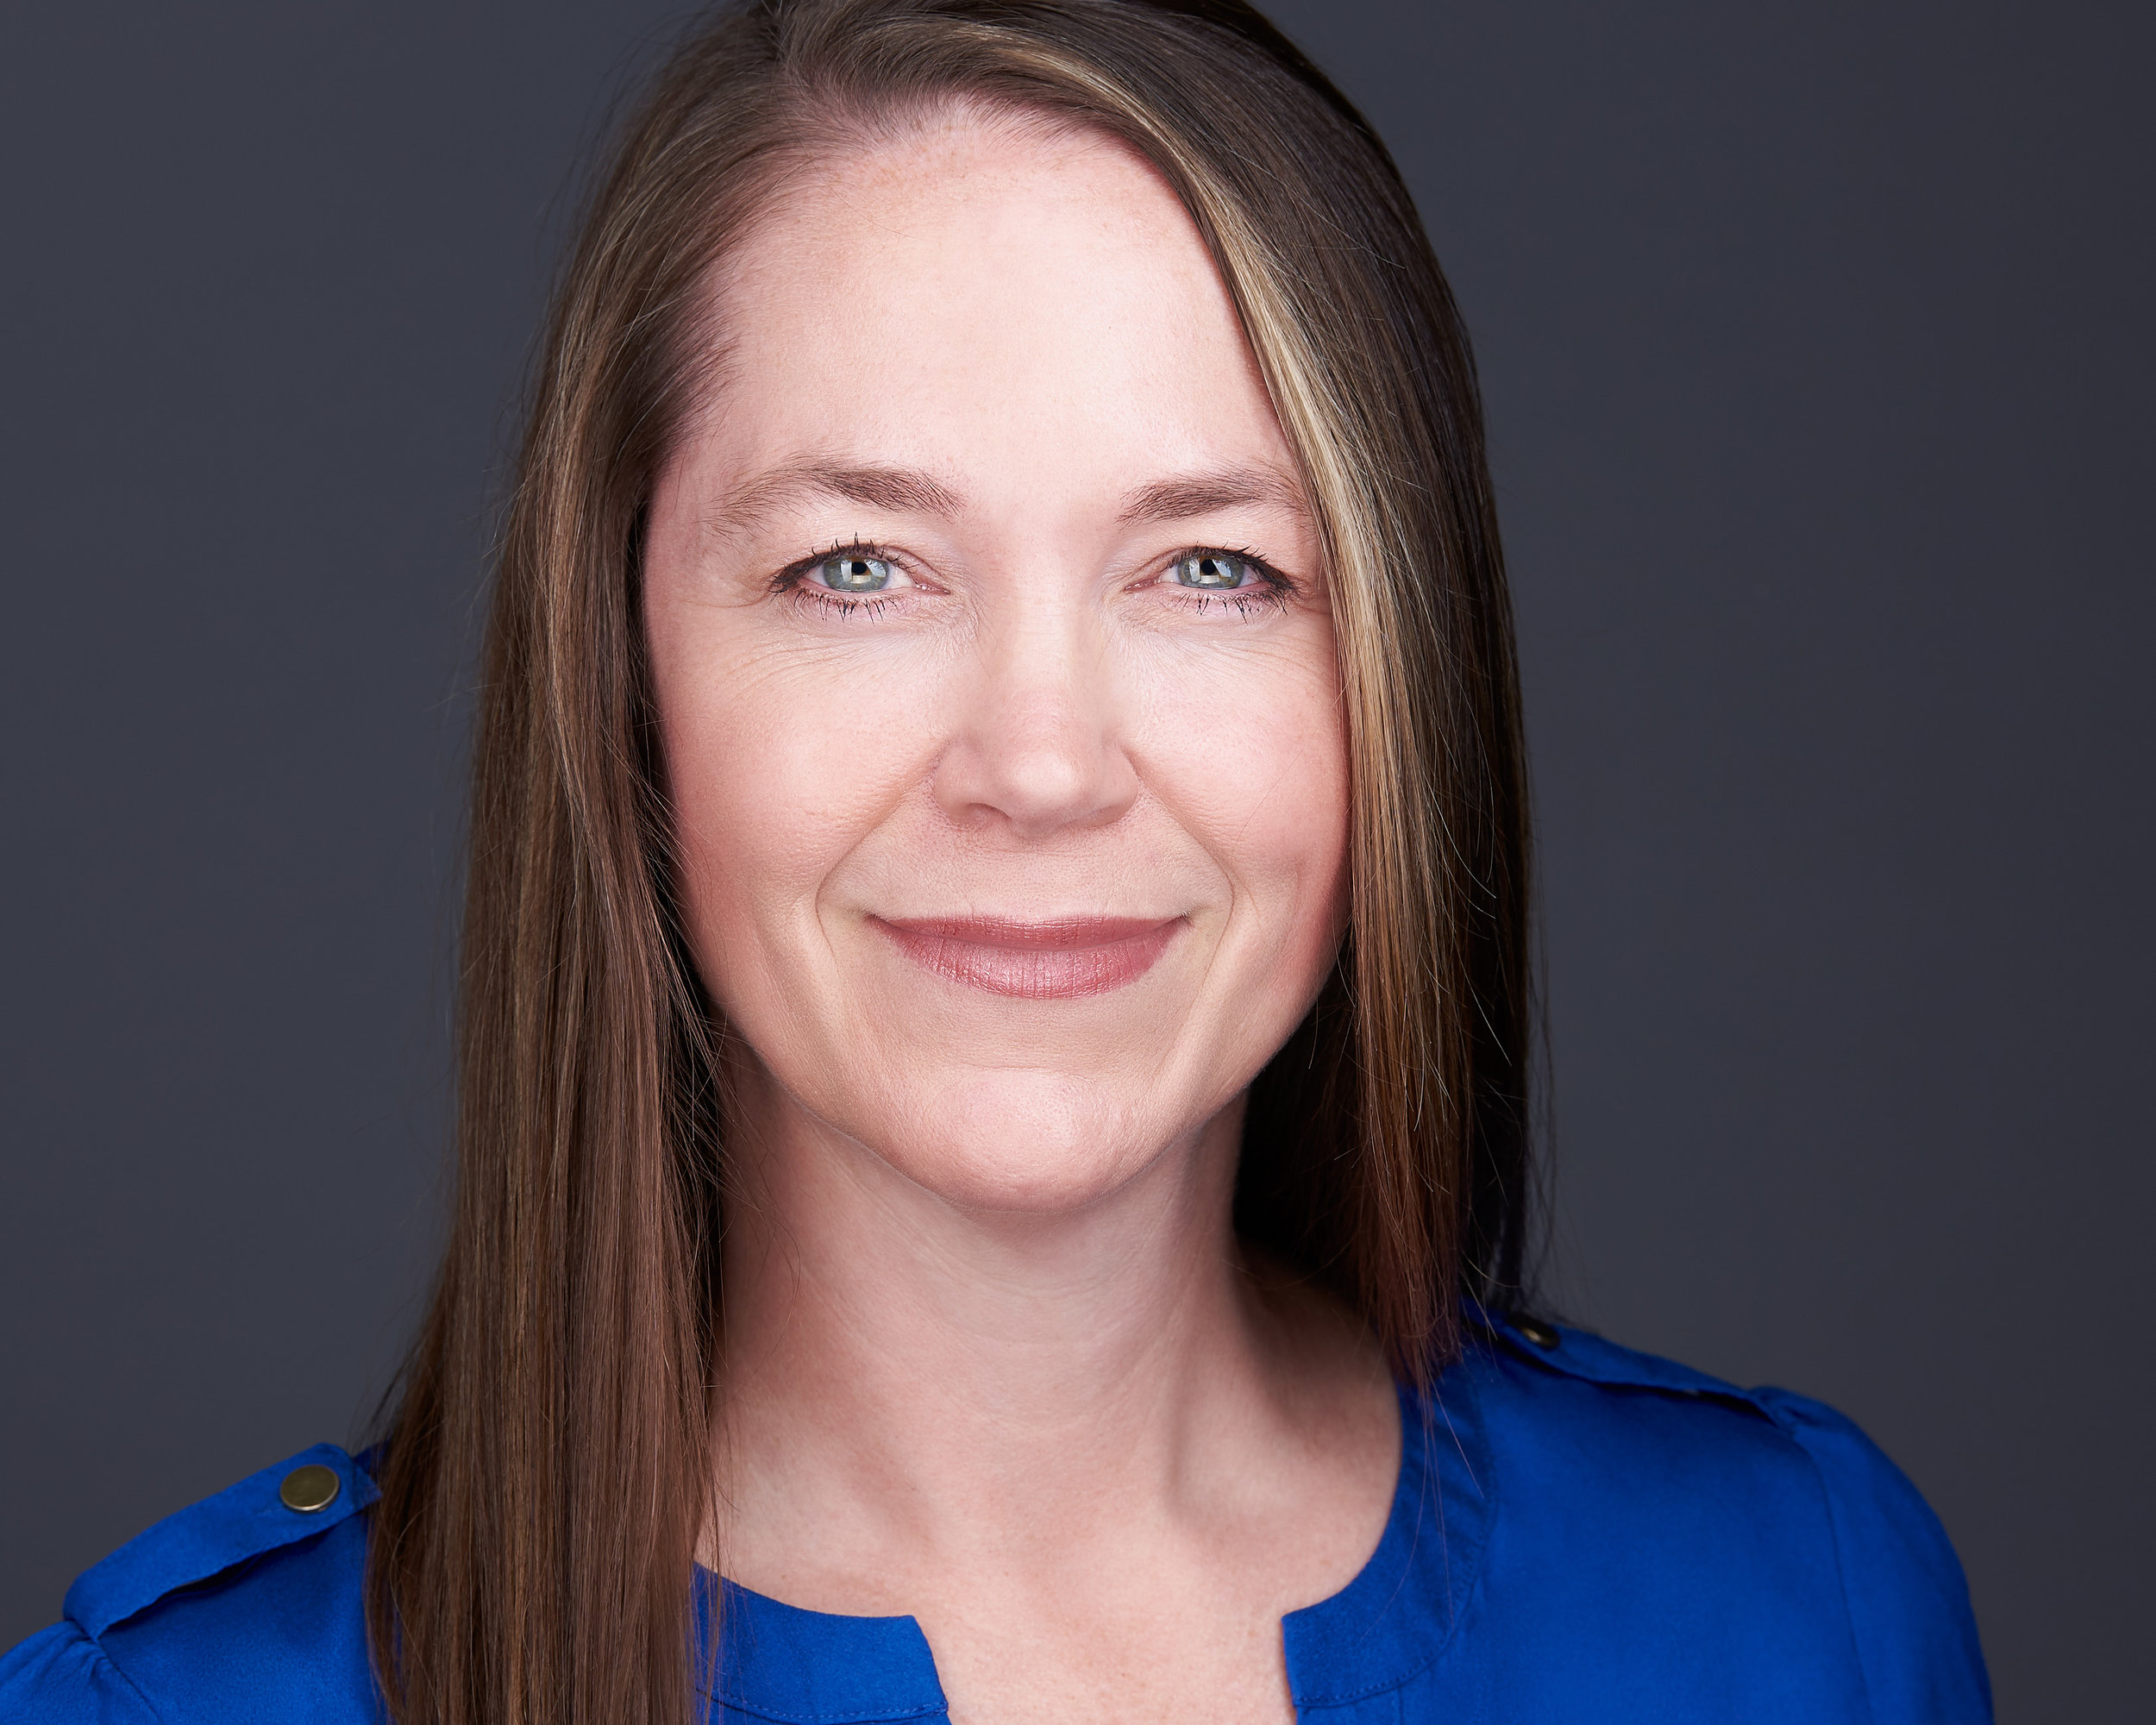 Tara Krauss- As Eye See It- Headshot Crew Associate- Colorado Headshot Photographer- Denver Headshot Photographer- Parker Headshot Photographer- Professional Headshots- Corporate Headshots